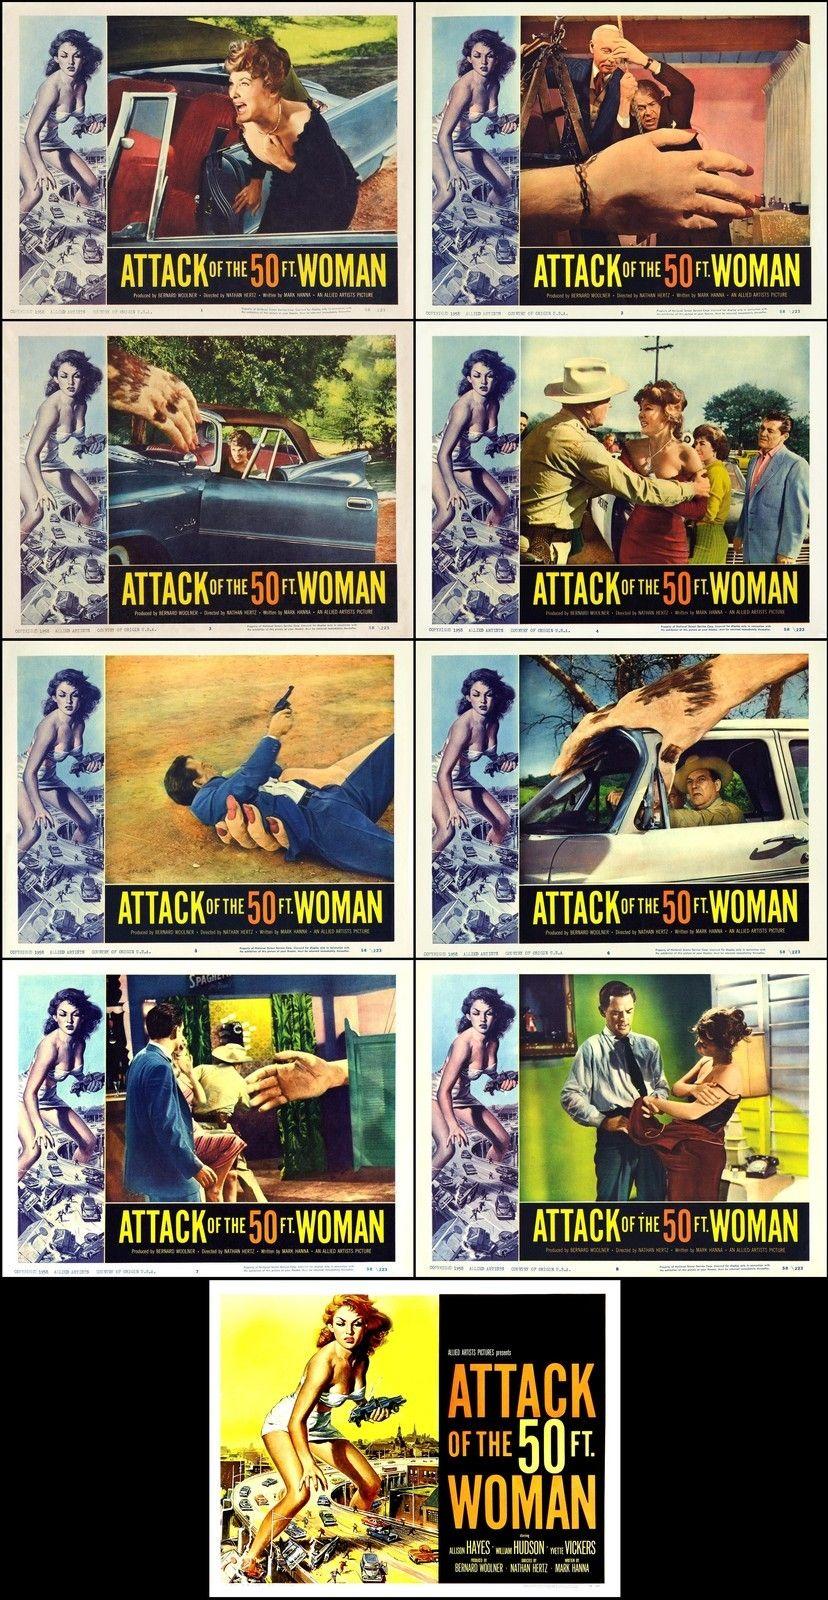 attackof50ftwoman_lcs